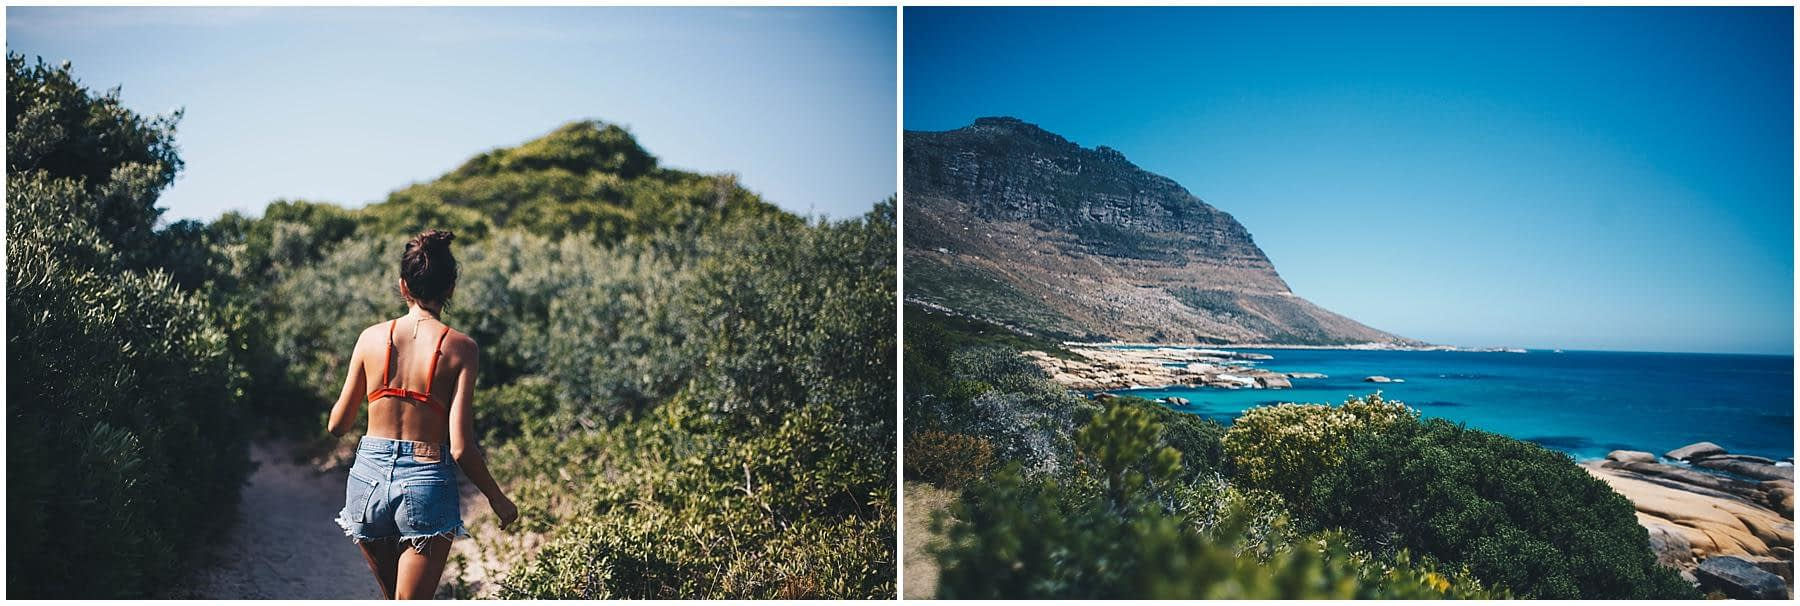 Cape Town_Llandudno_0022.jpg